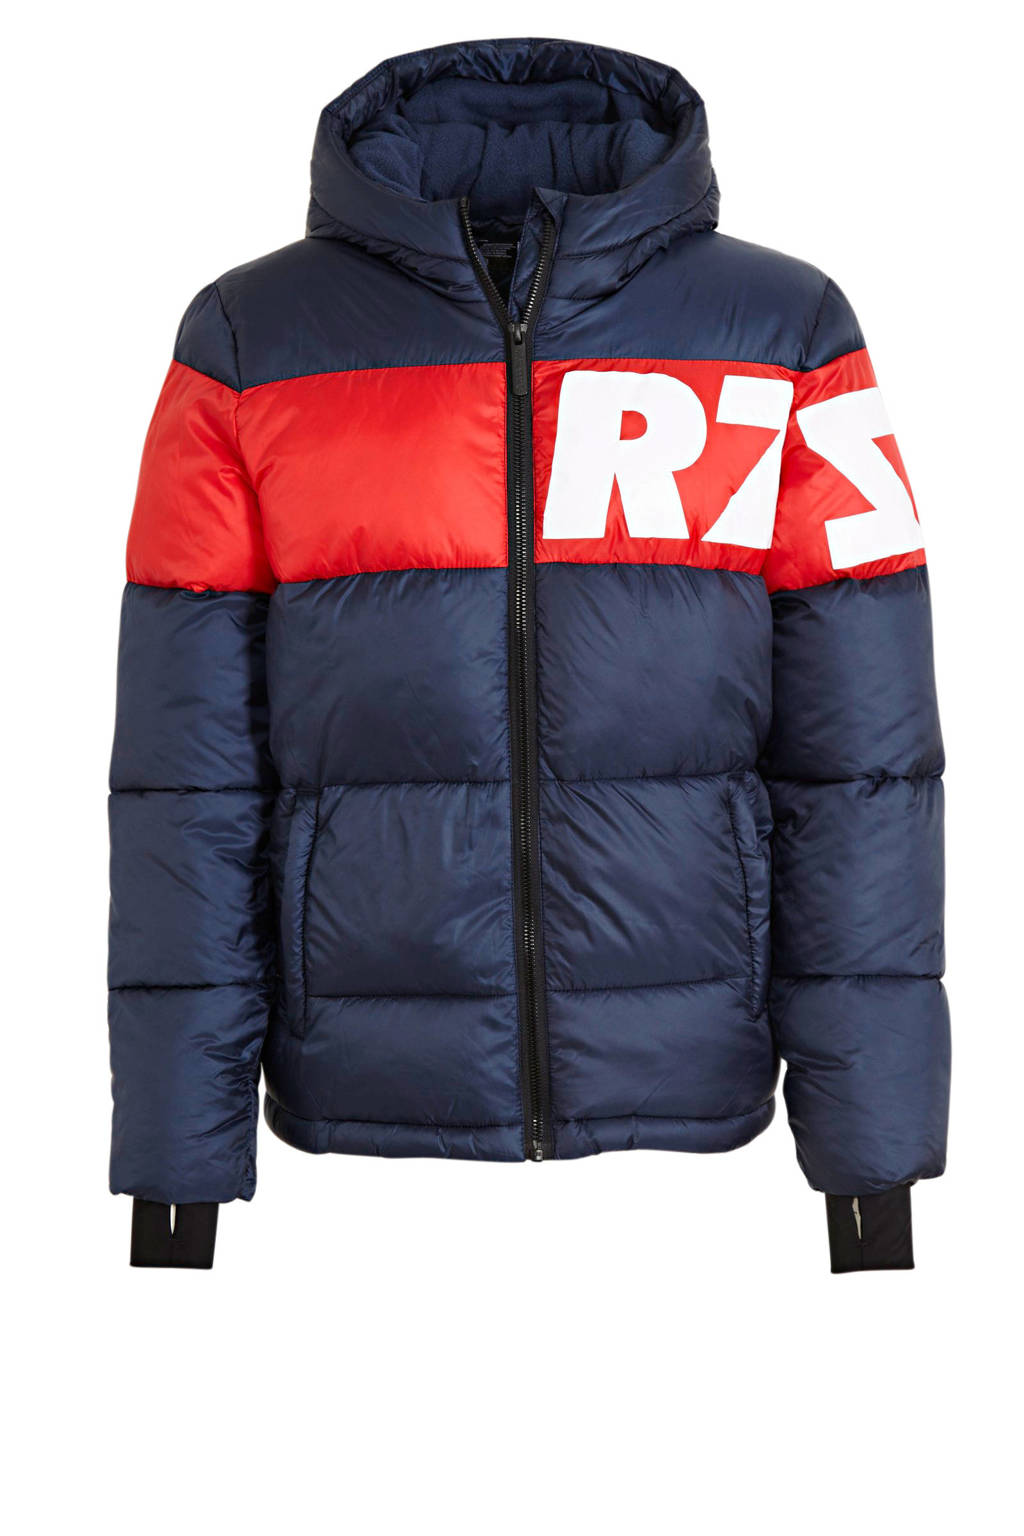 Raizzed gewatteerde winterjas Tacoma donkerblauw/rood, Donkerblauw/rood